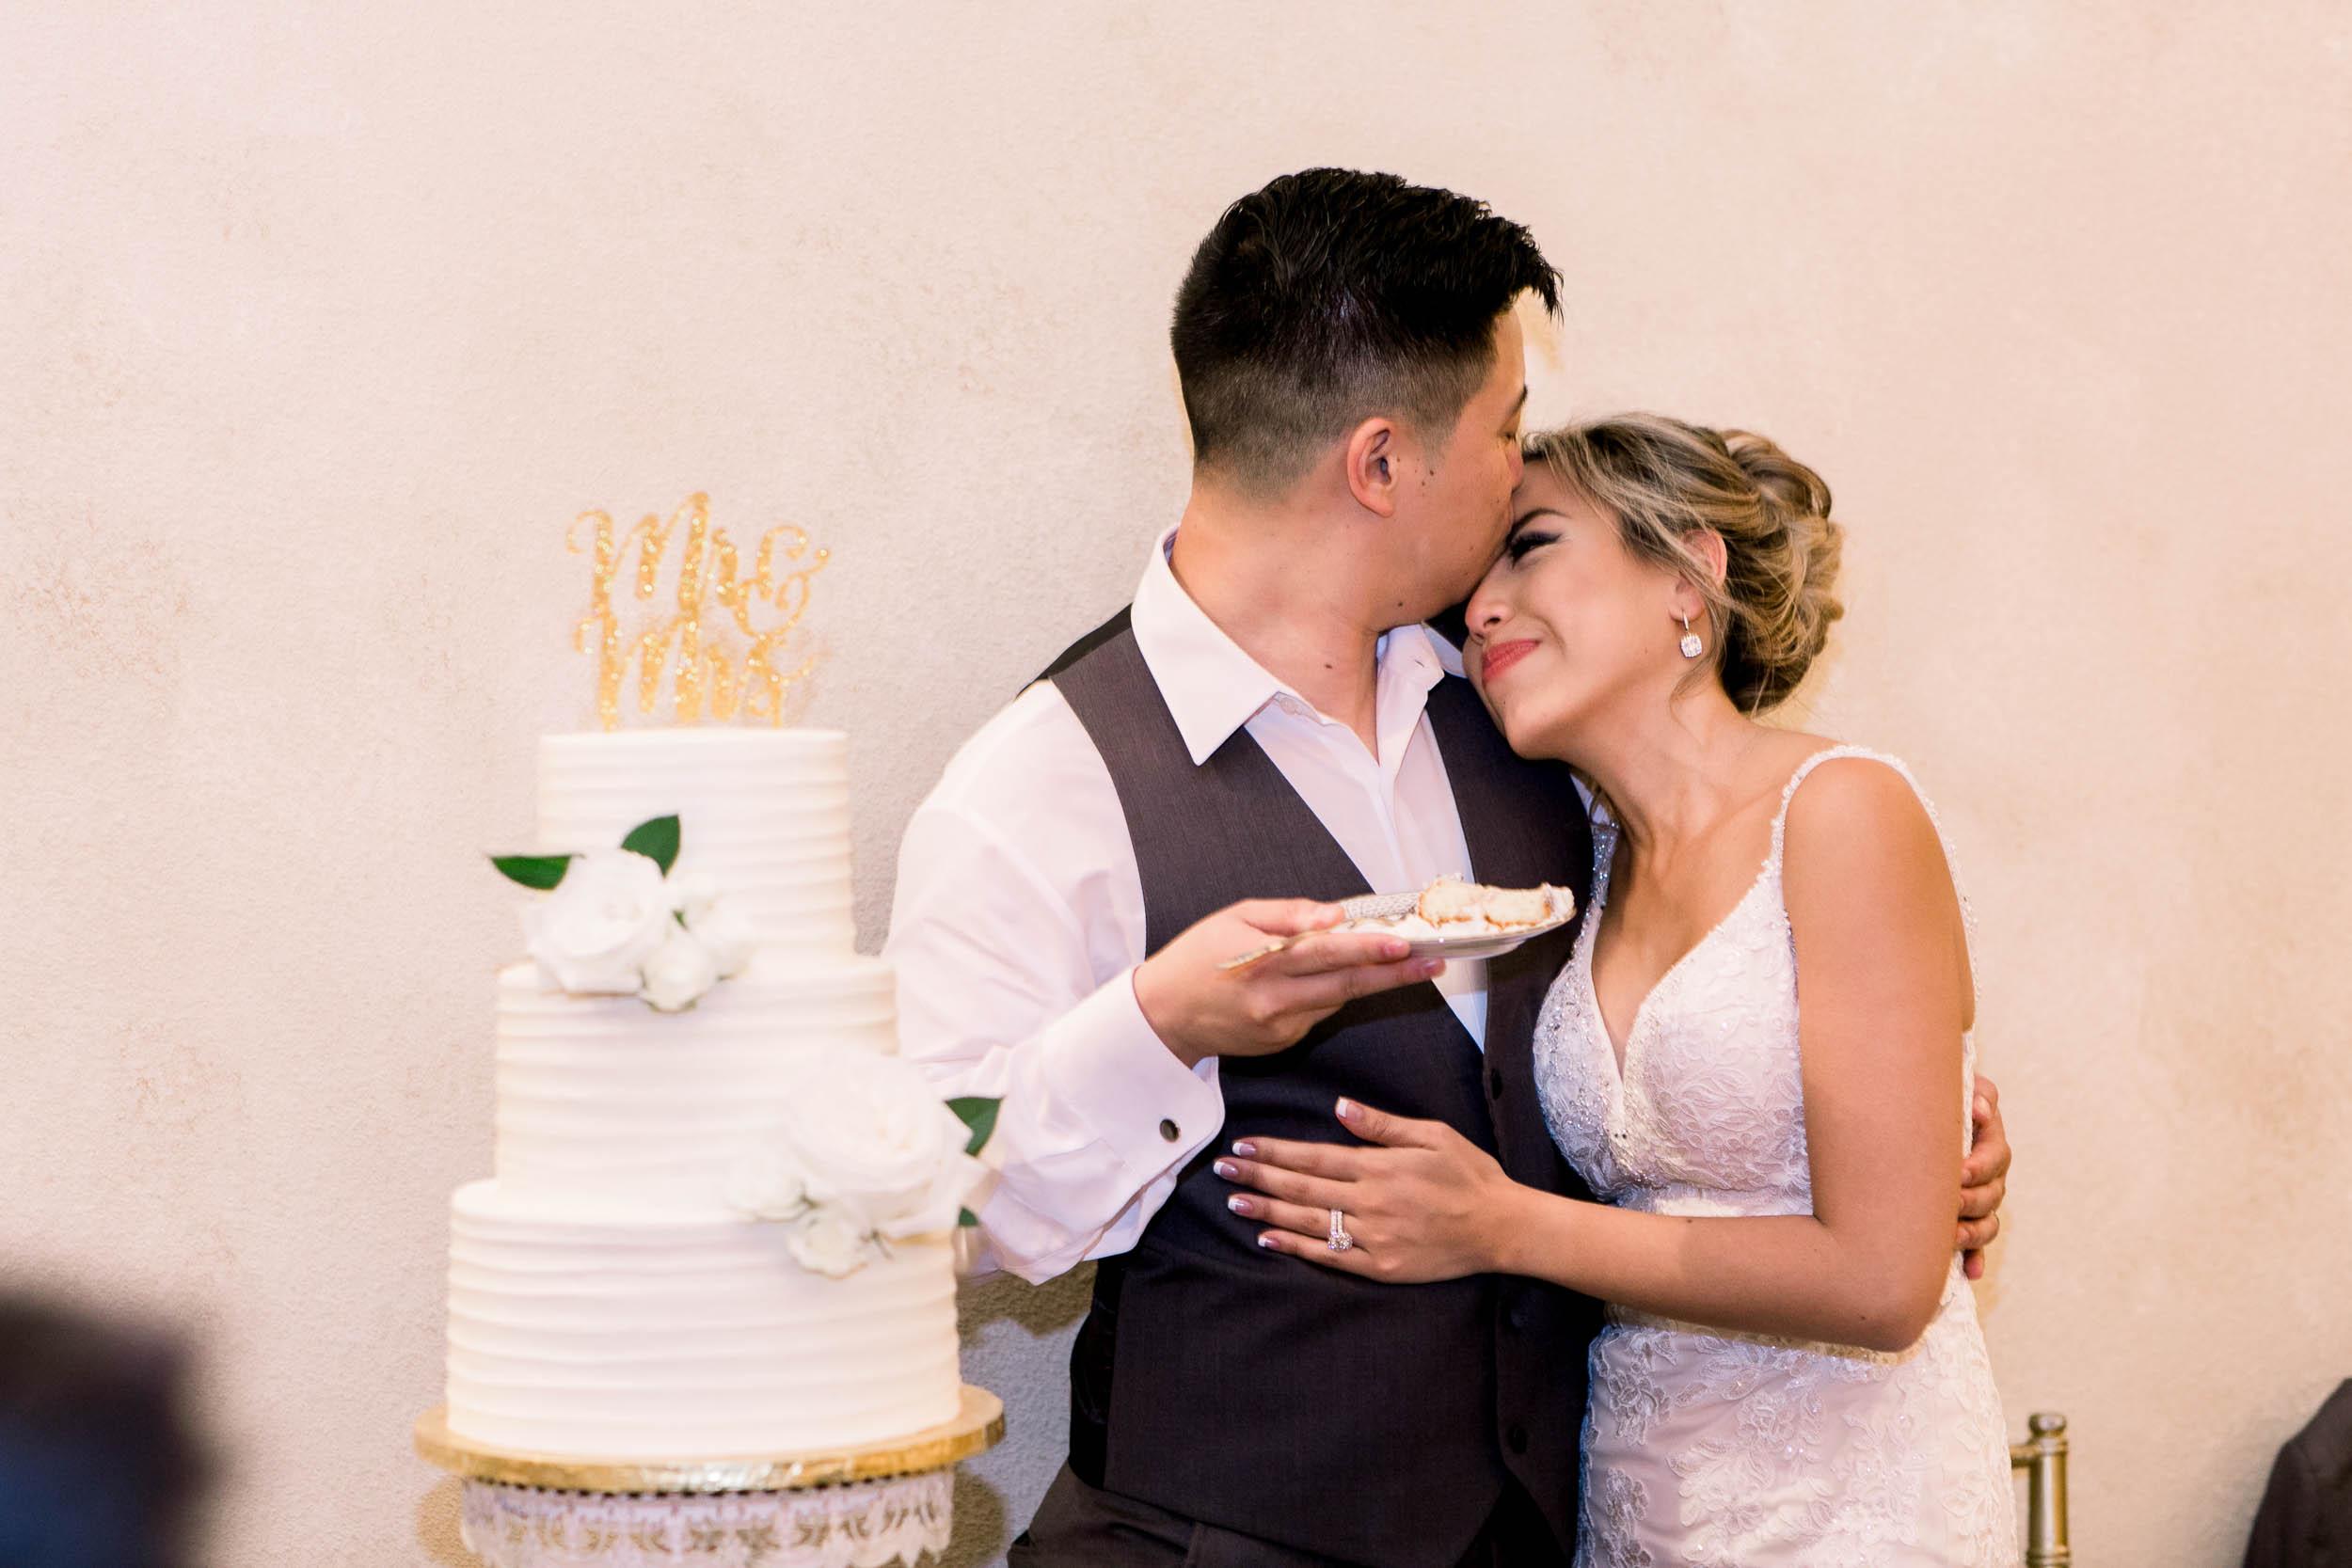 Las Positas Wedding_Buena Lane Photography_090118ER878.jpg